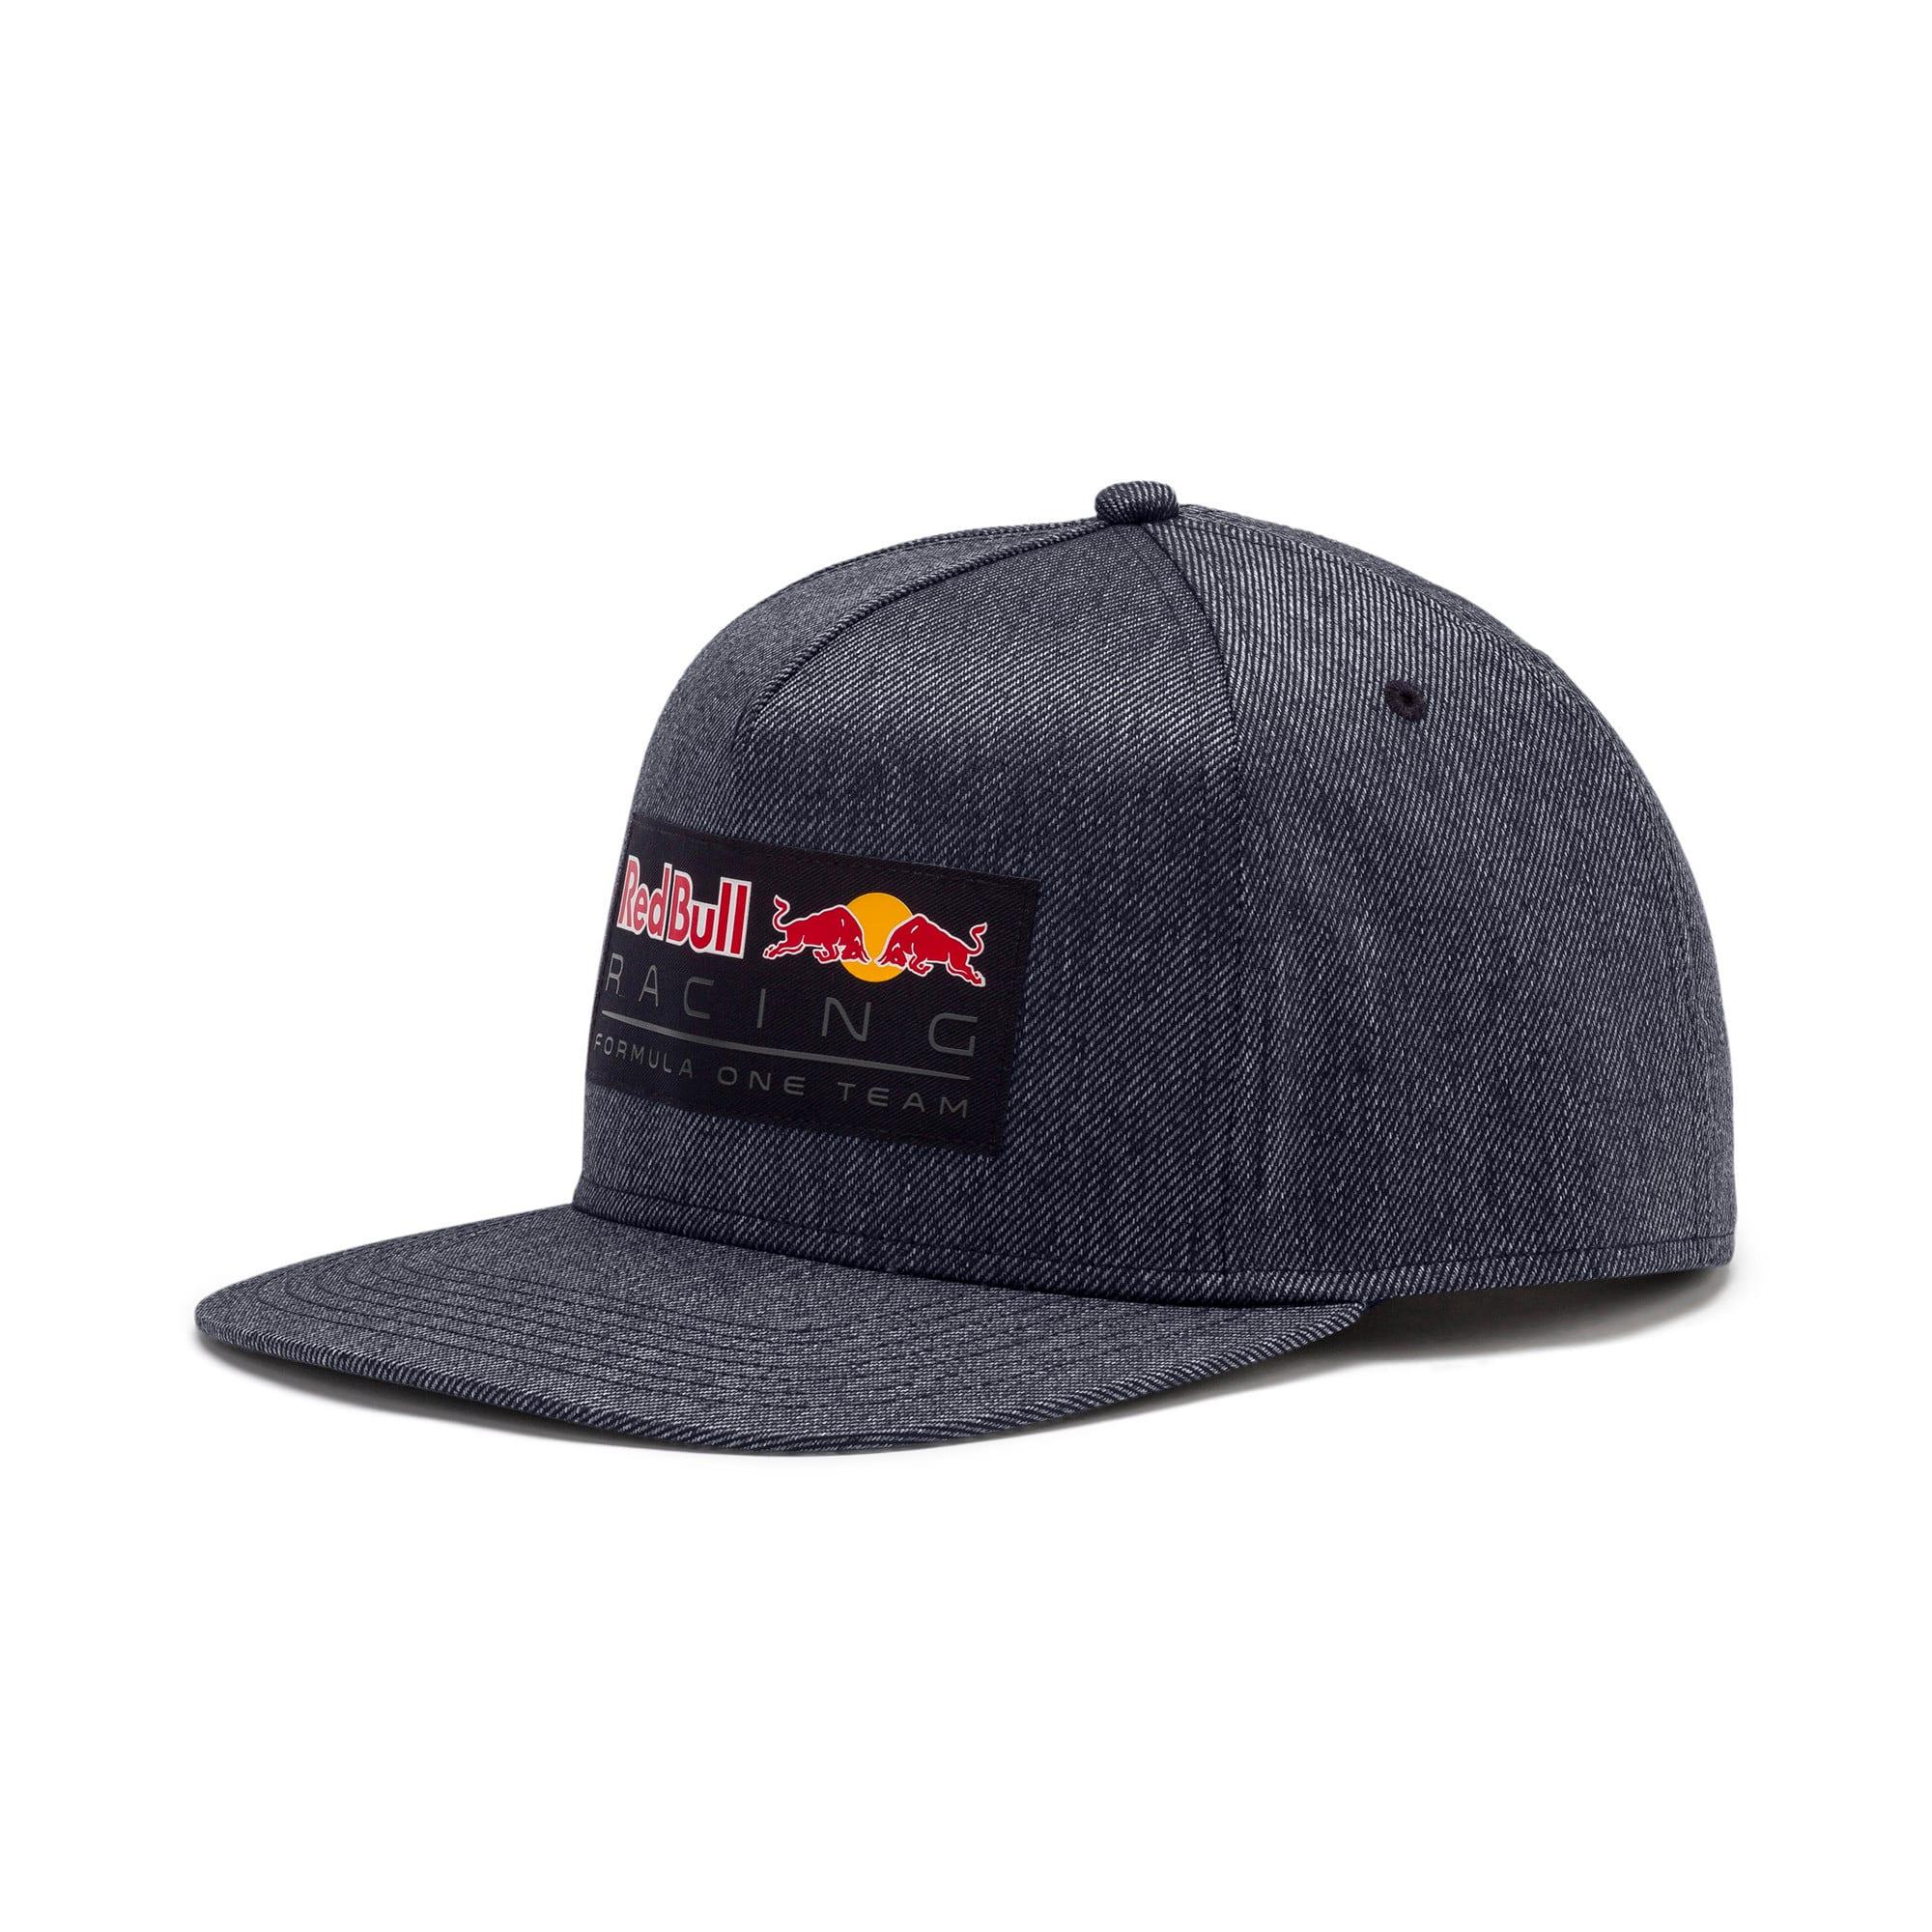 Thumbnail 1 of Red Bull Racing Lifestyle Flat Brim Cap, NIGHT SKY, medium-IND